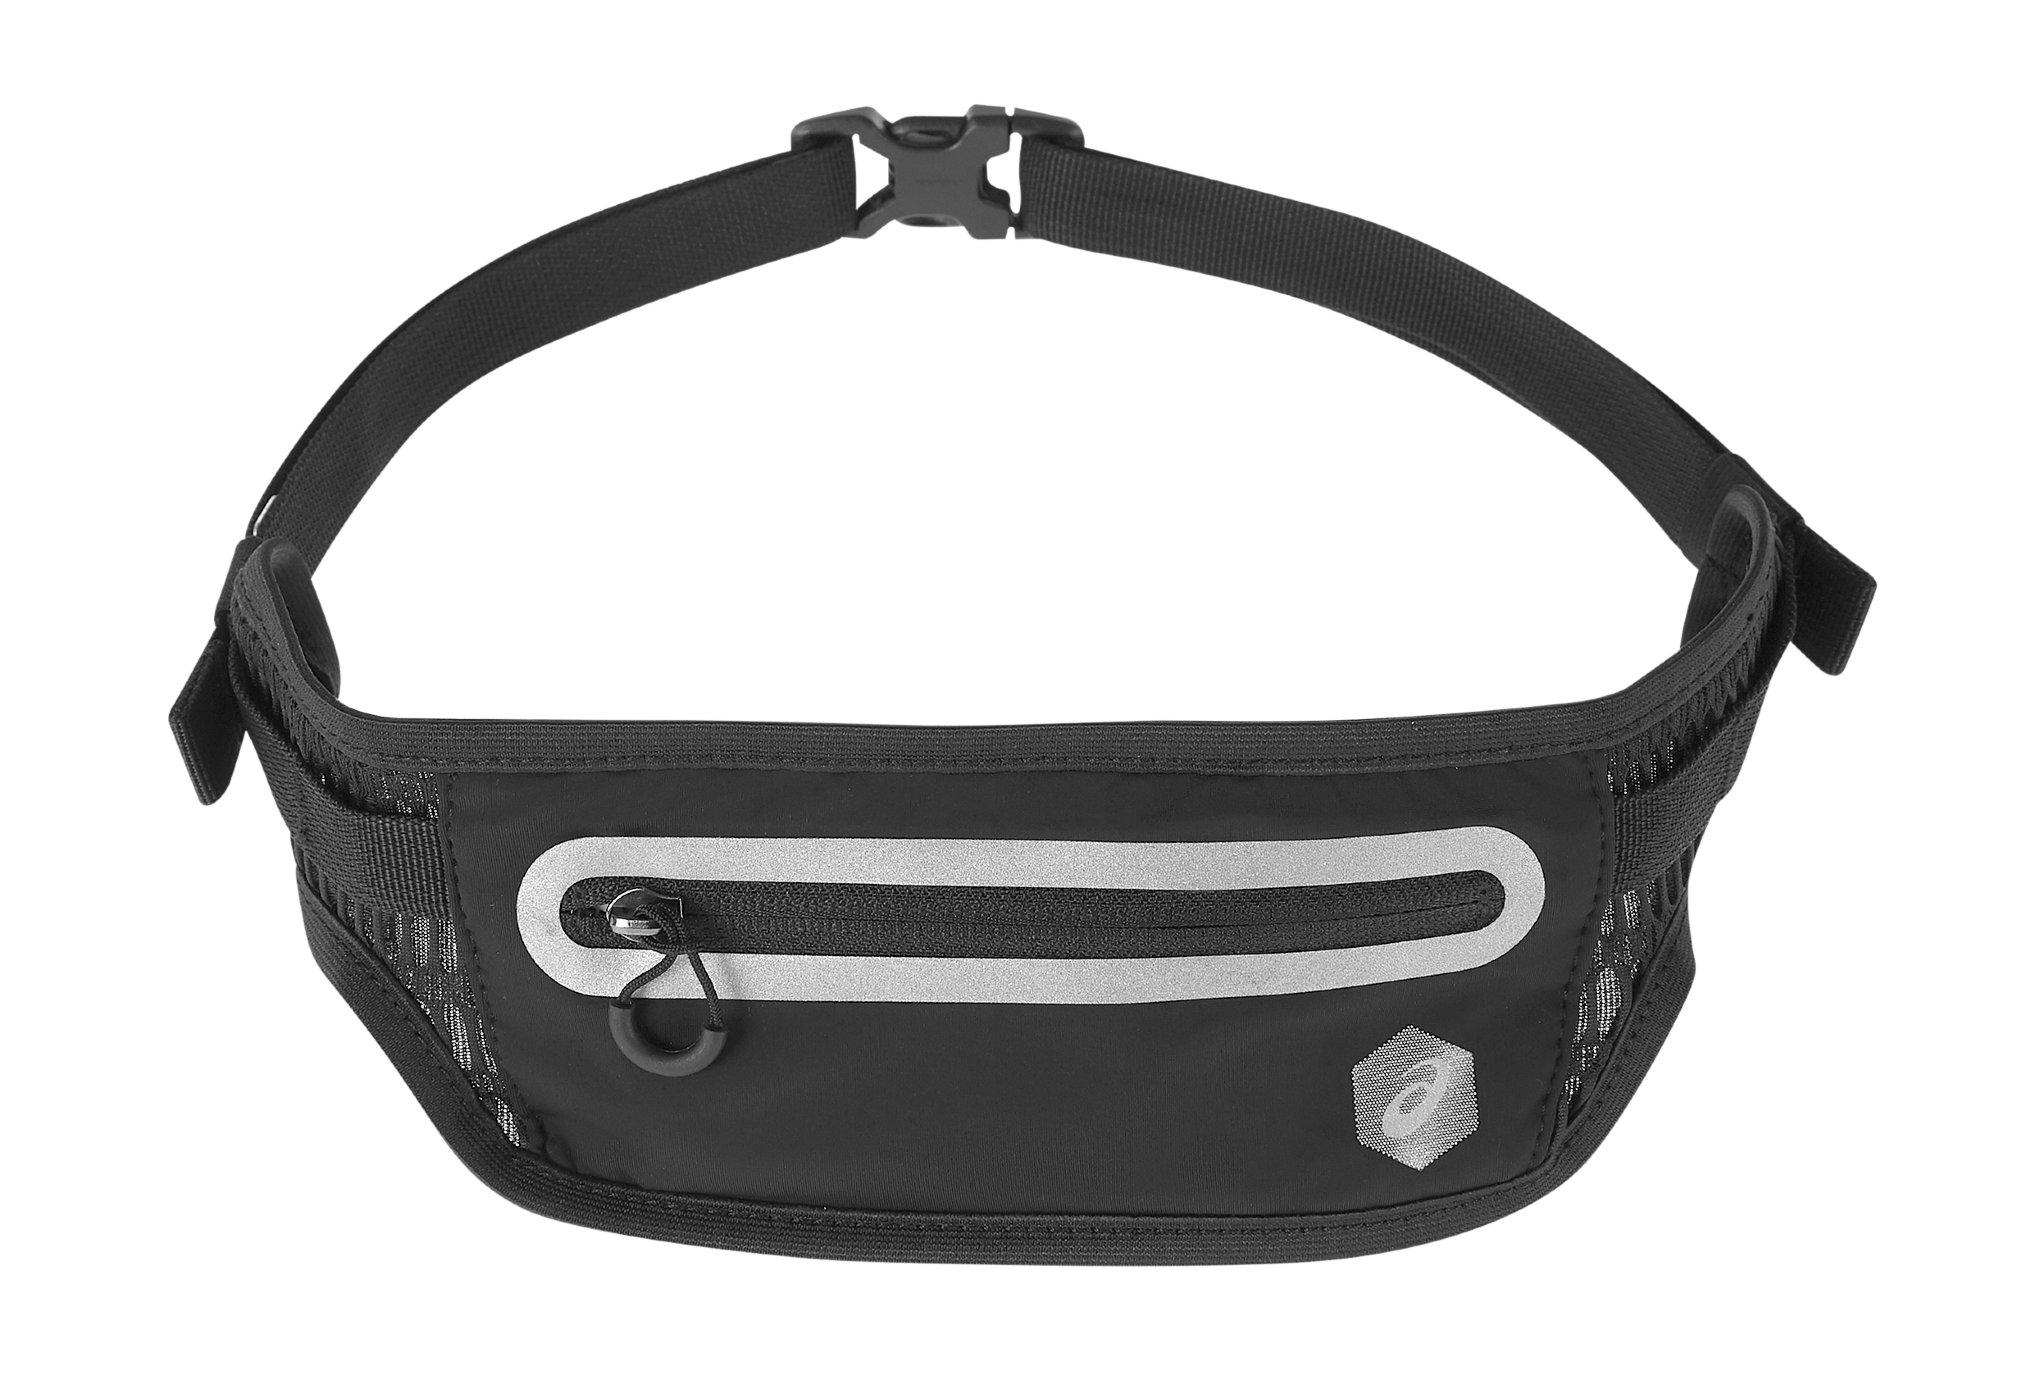 Asics Waist pouch - m ceinture / porte dossard